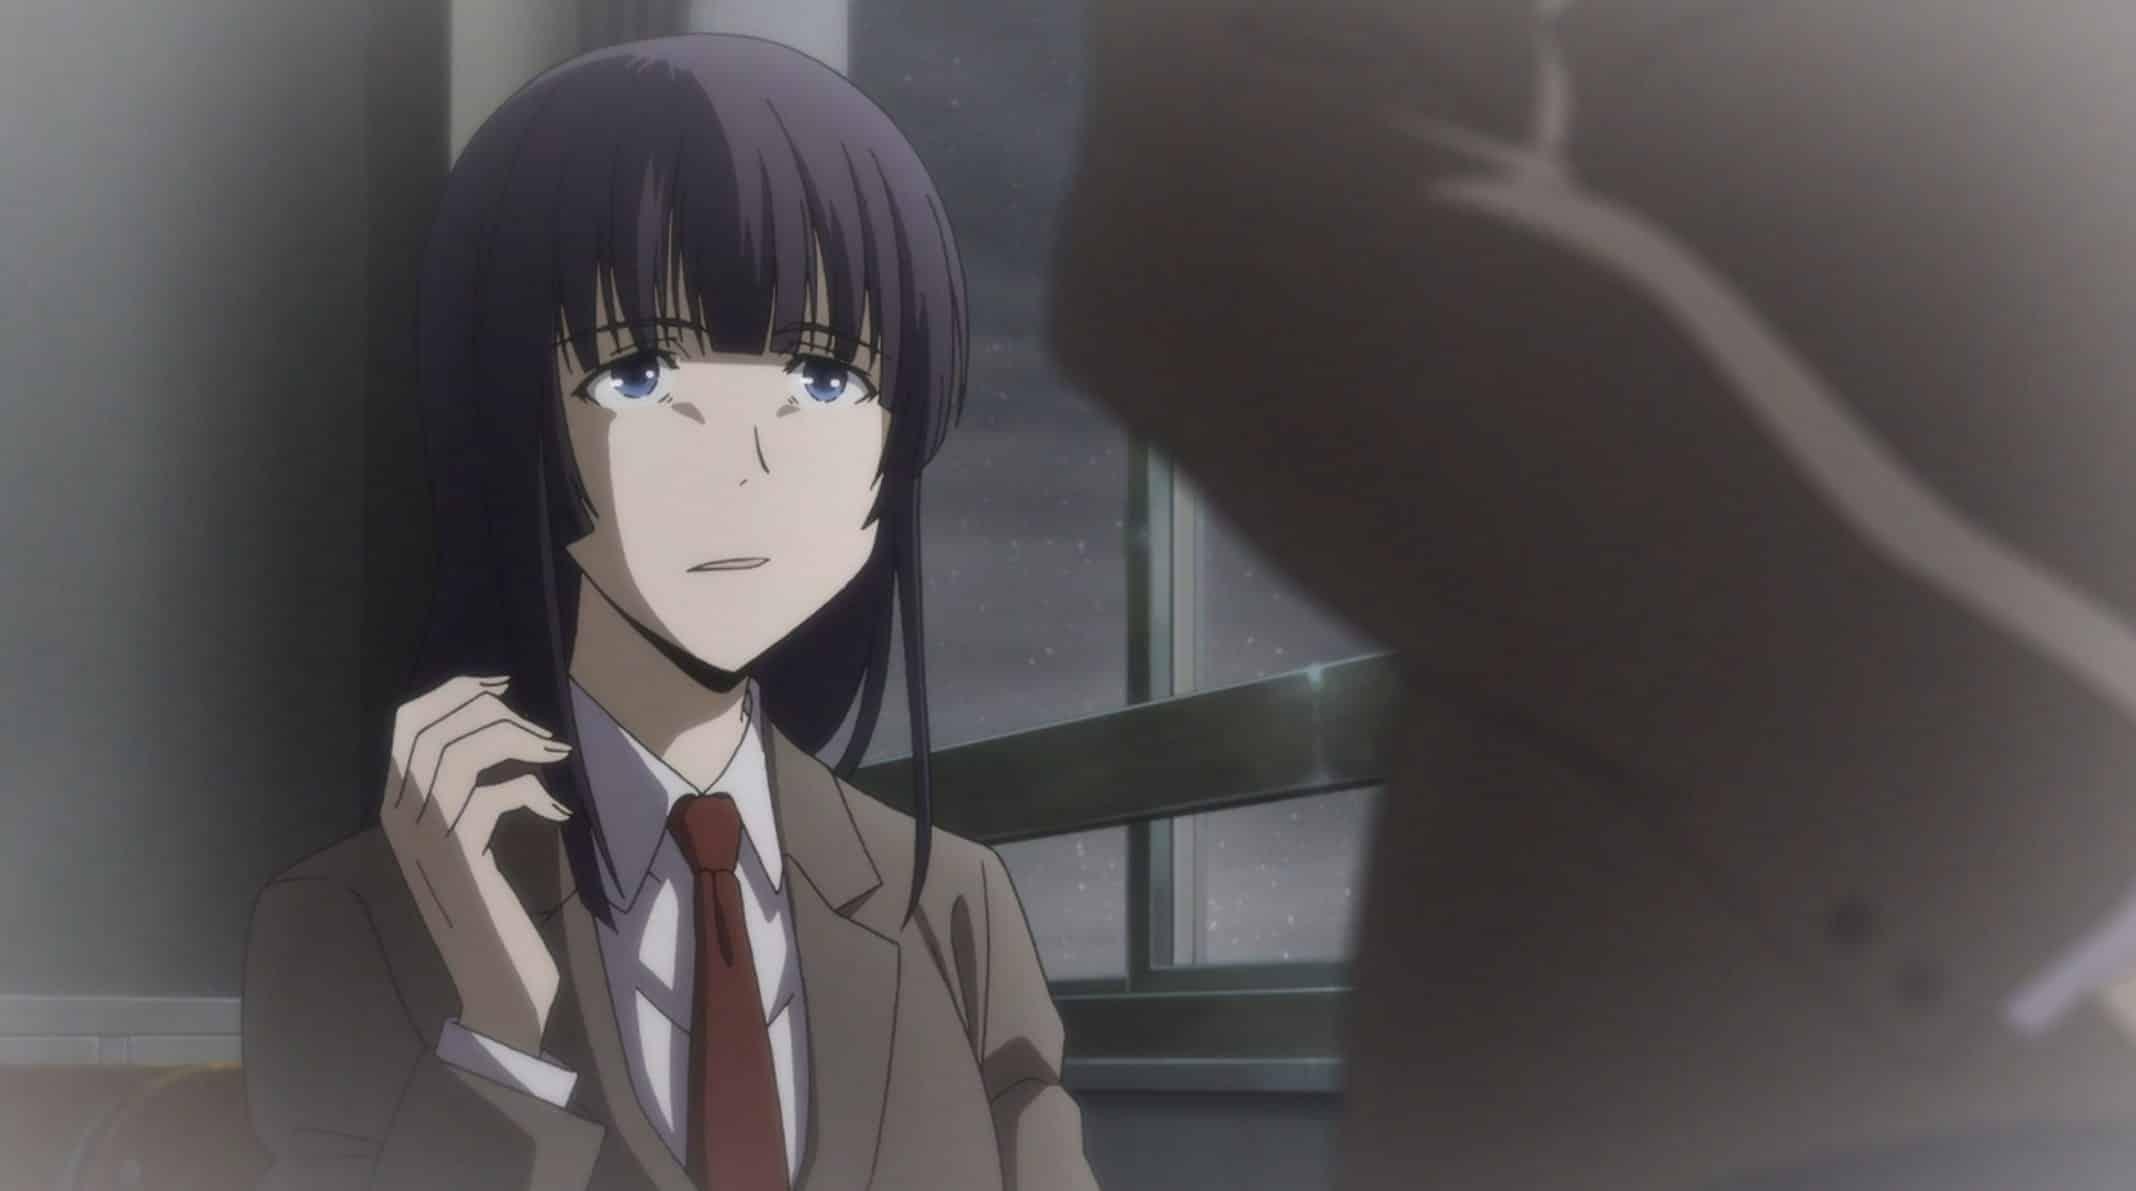 Koyanagi (Itou Shizuka) reacting to Elena's kindness.